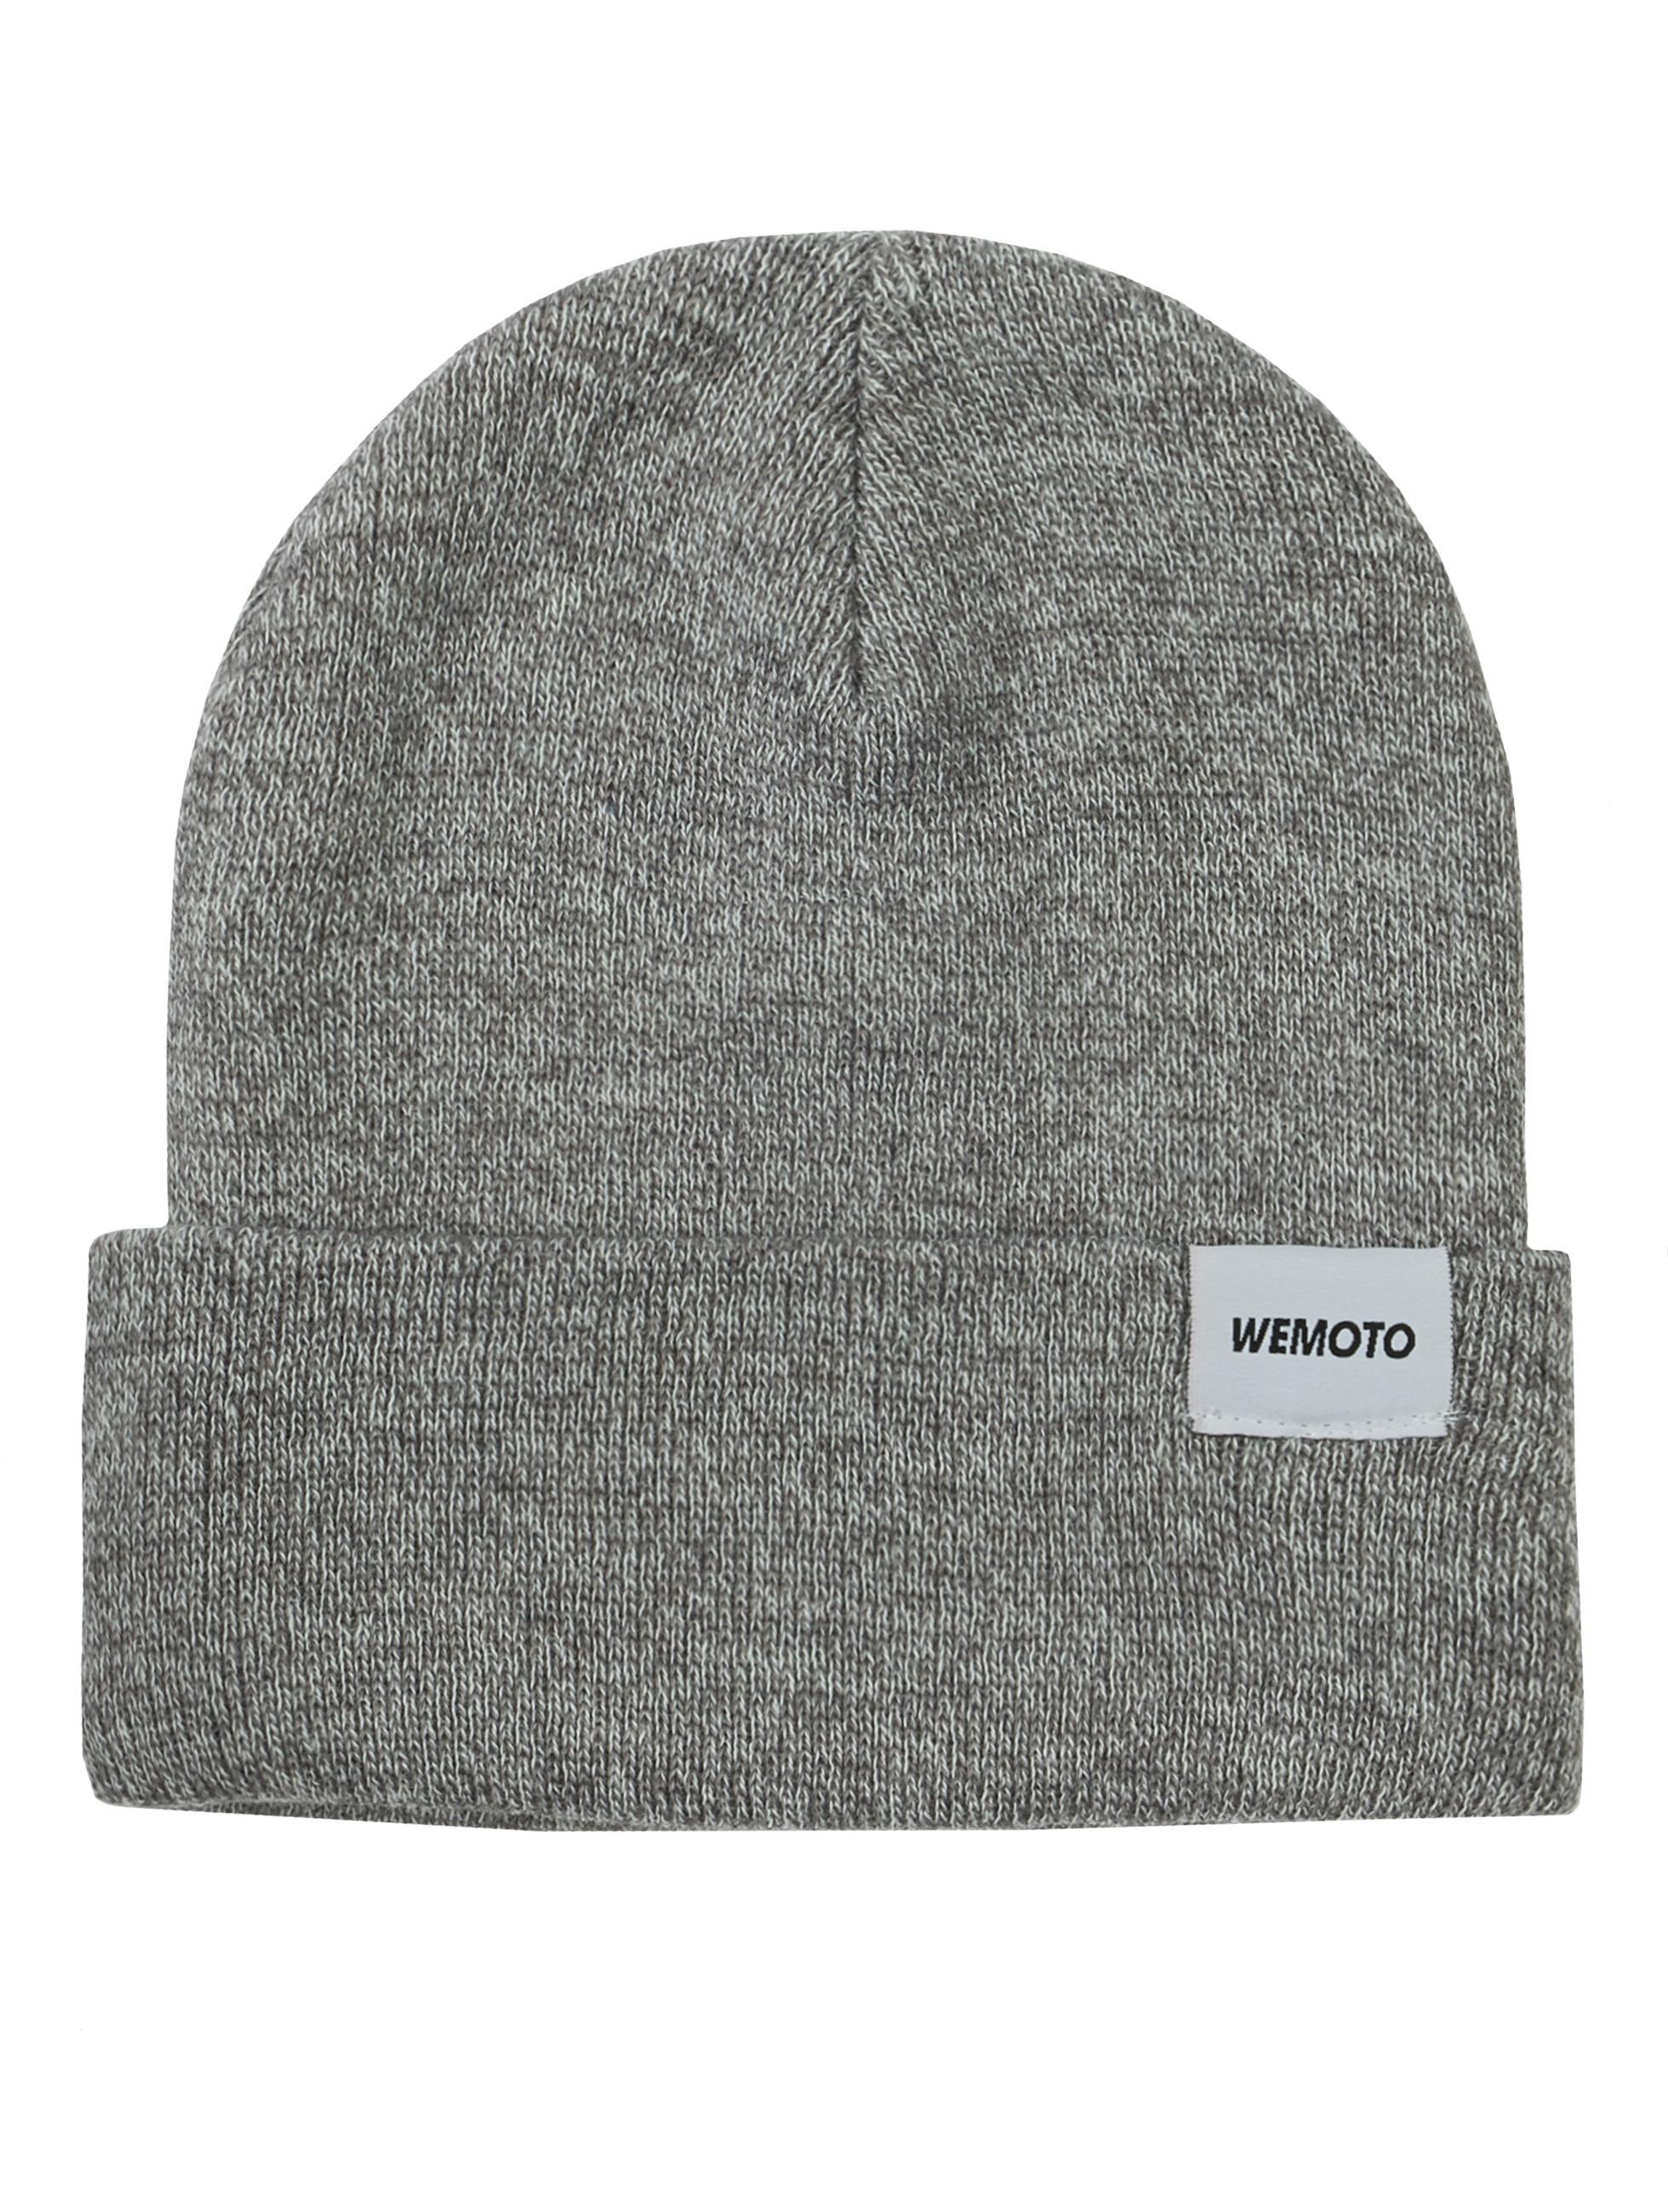 Wemoto | North gris Homme,Femme Bonnet